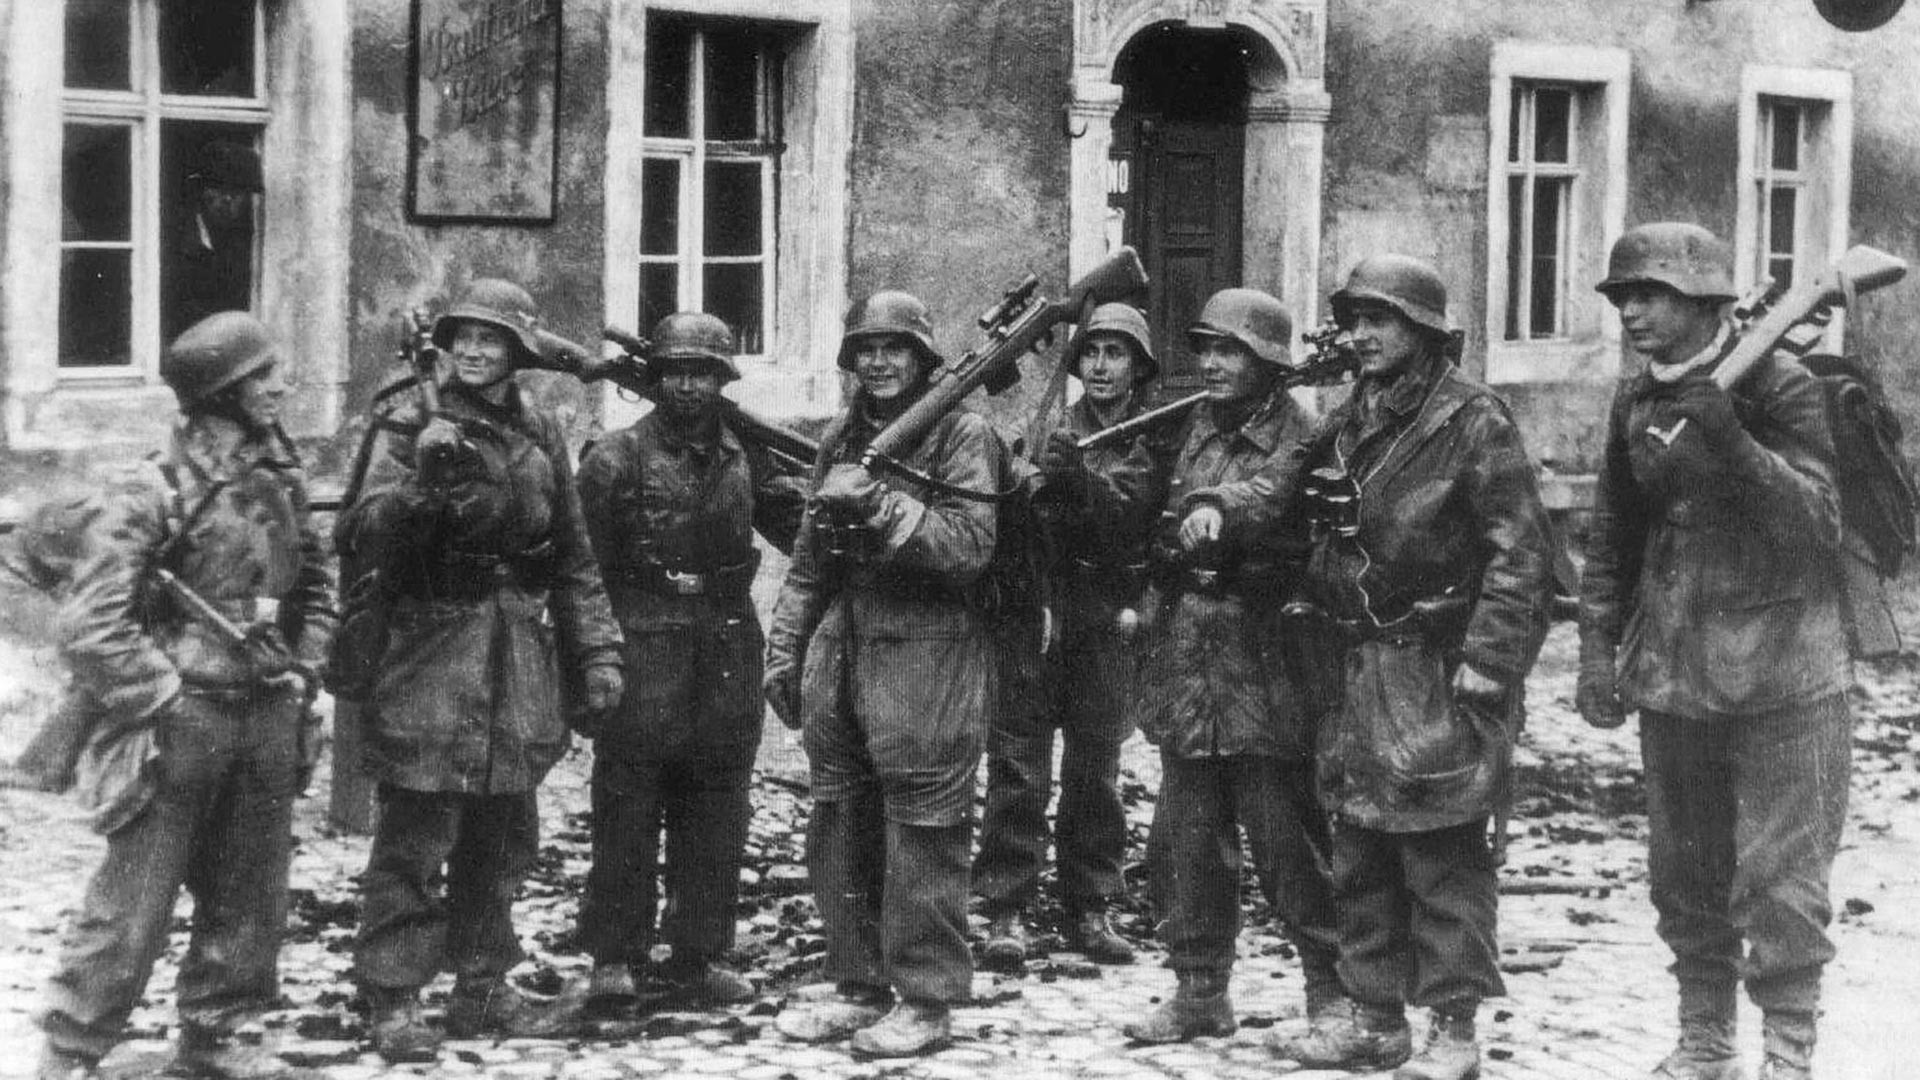 Soldiers of the 1st Paratroop Panzer Division Hermann Goering near Bautzen.